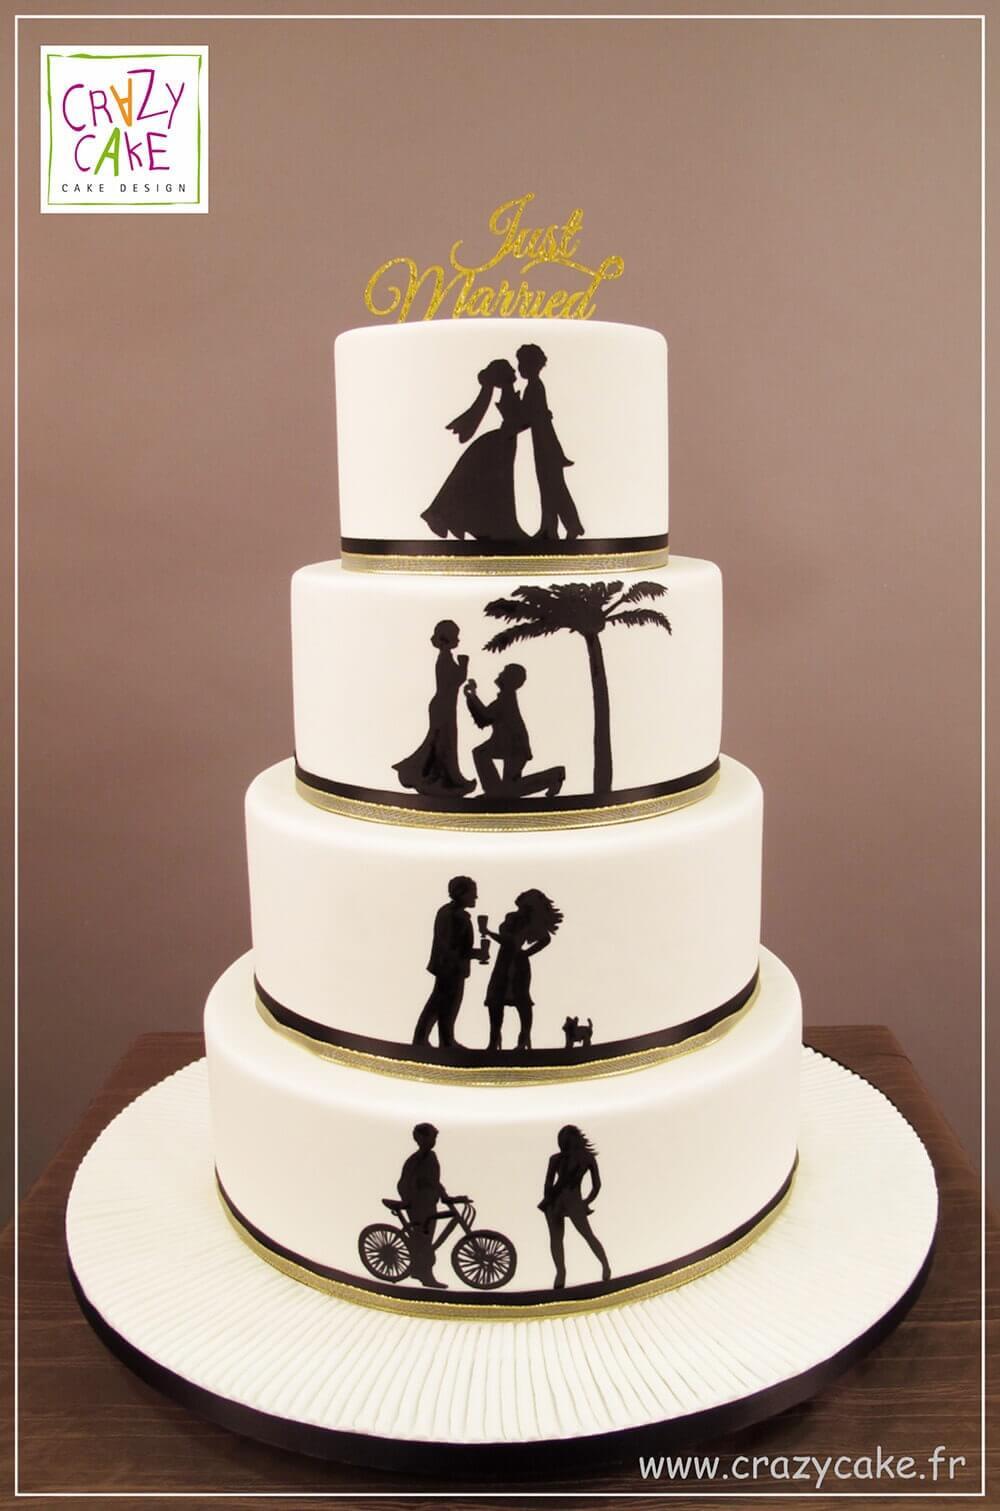 Wedding Cakes 224 Th 232 Me Blog